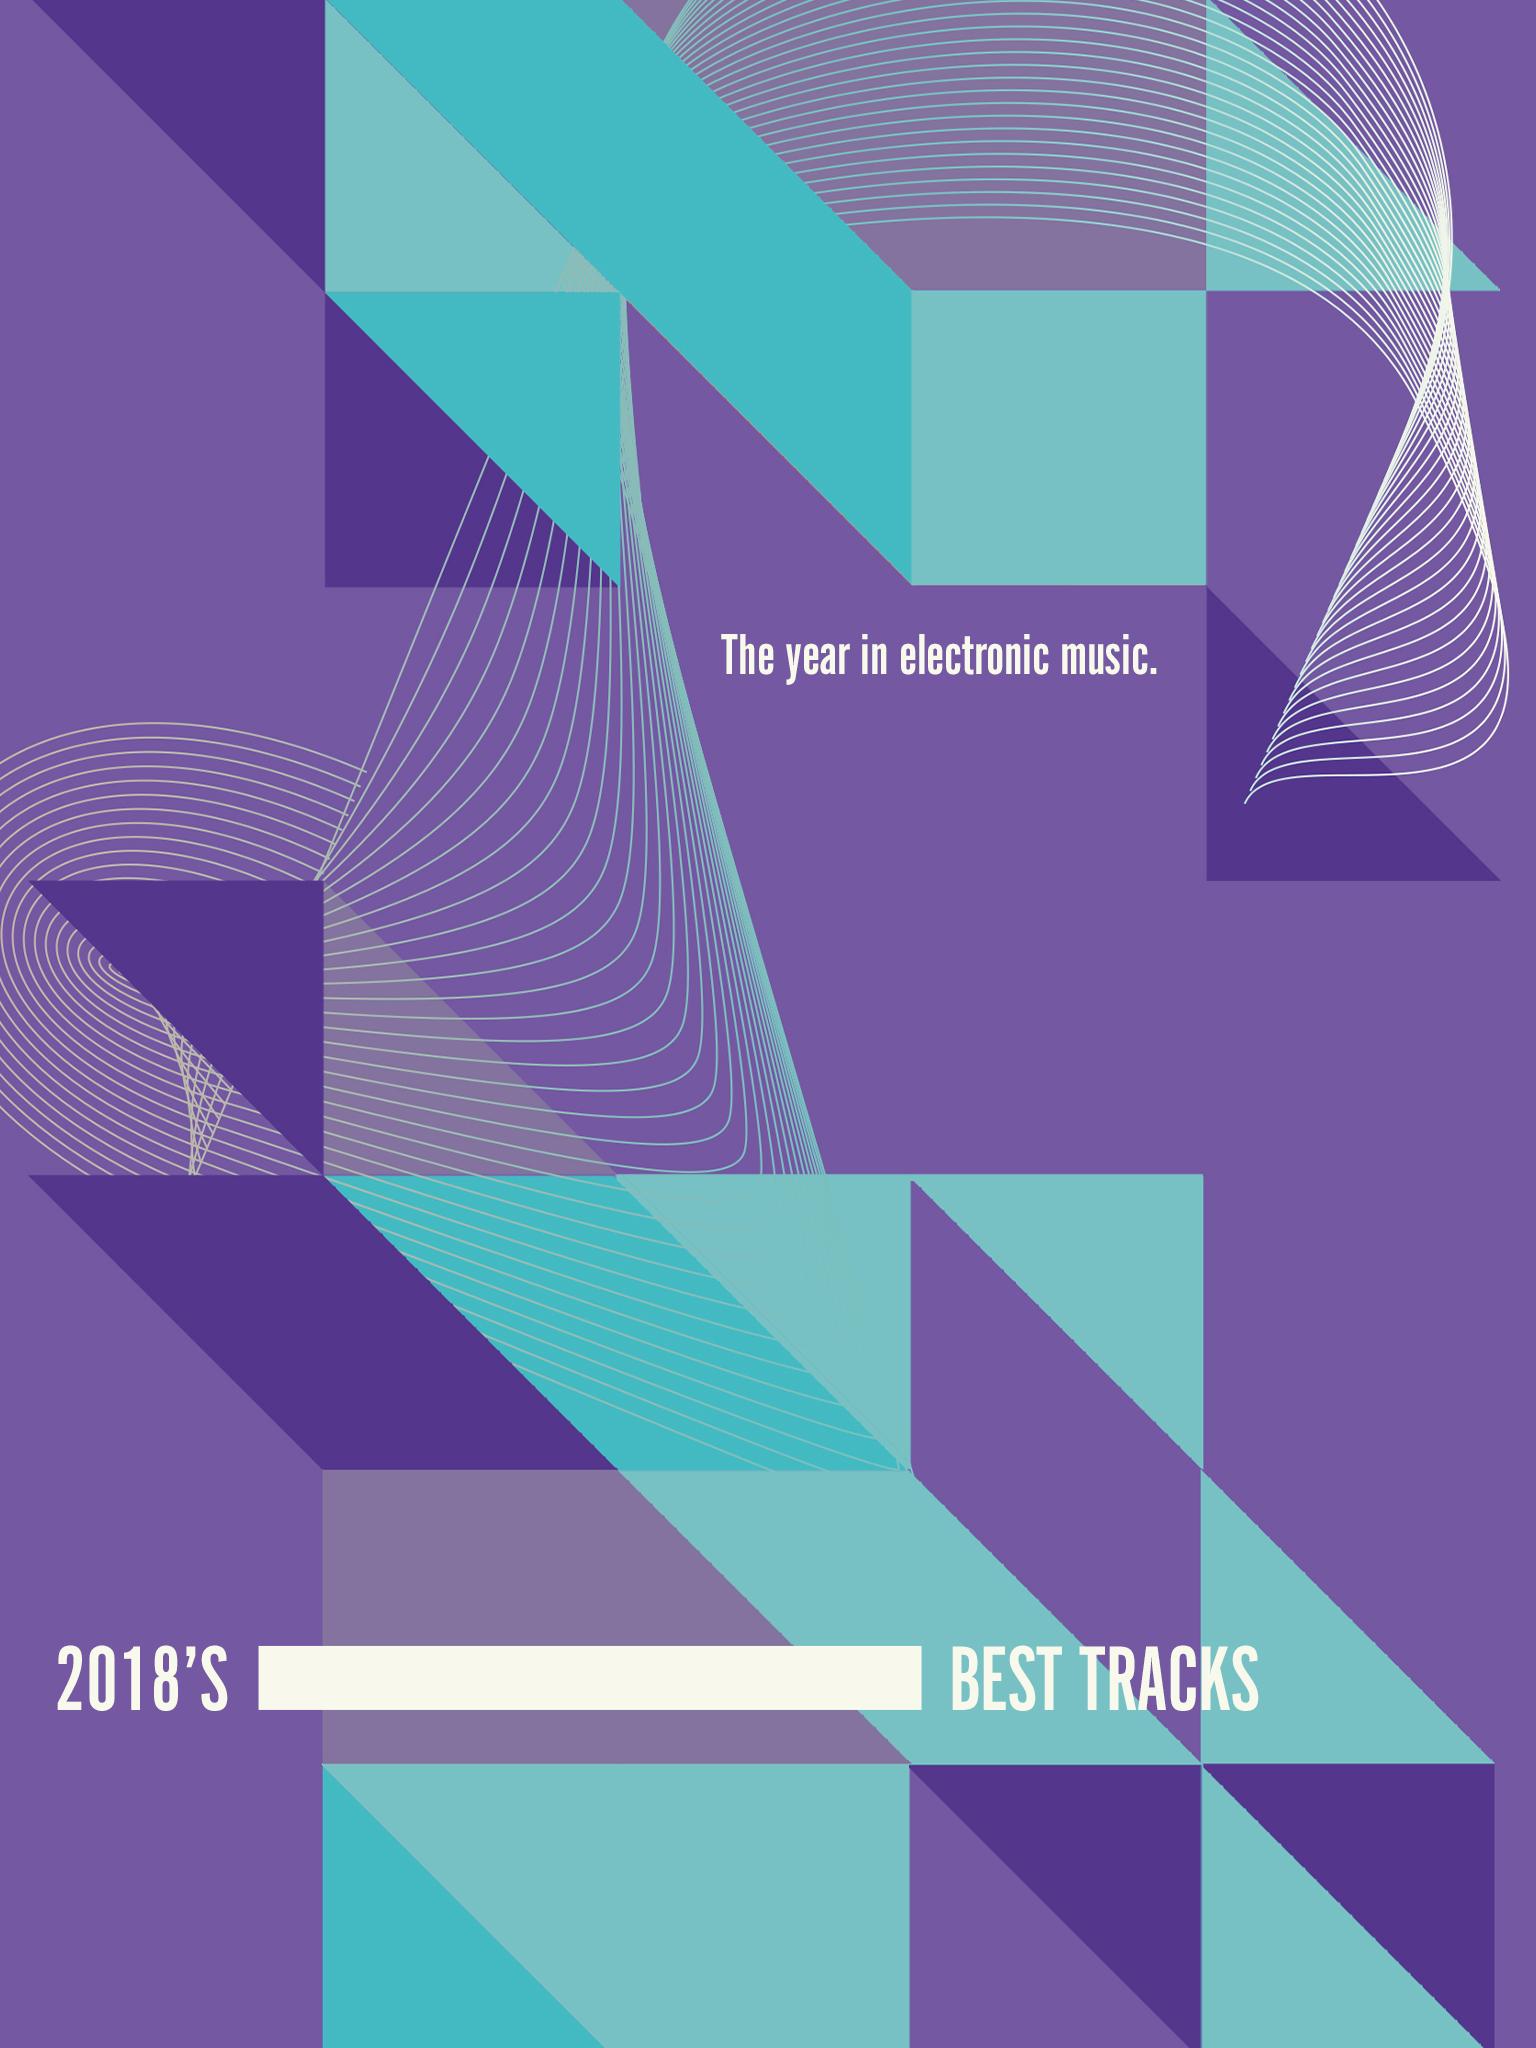 2018's Best Tracks